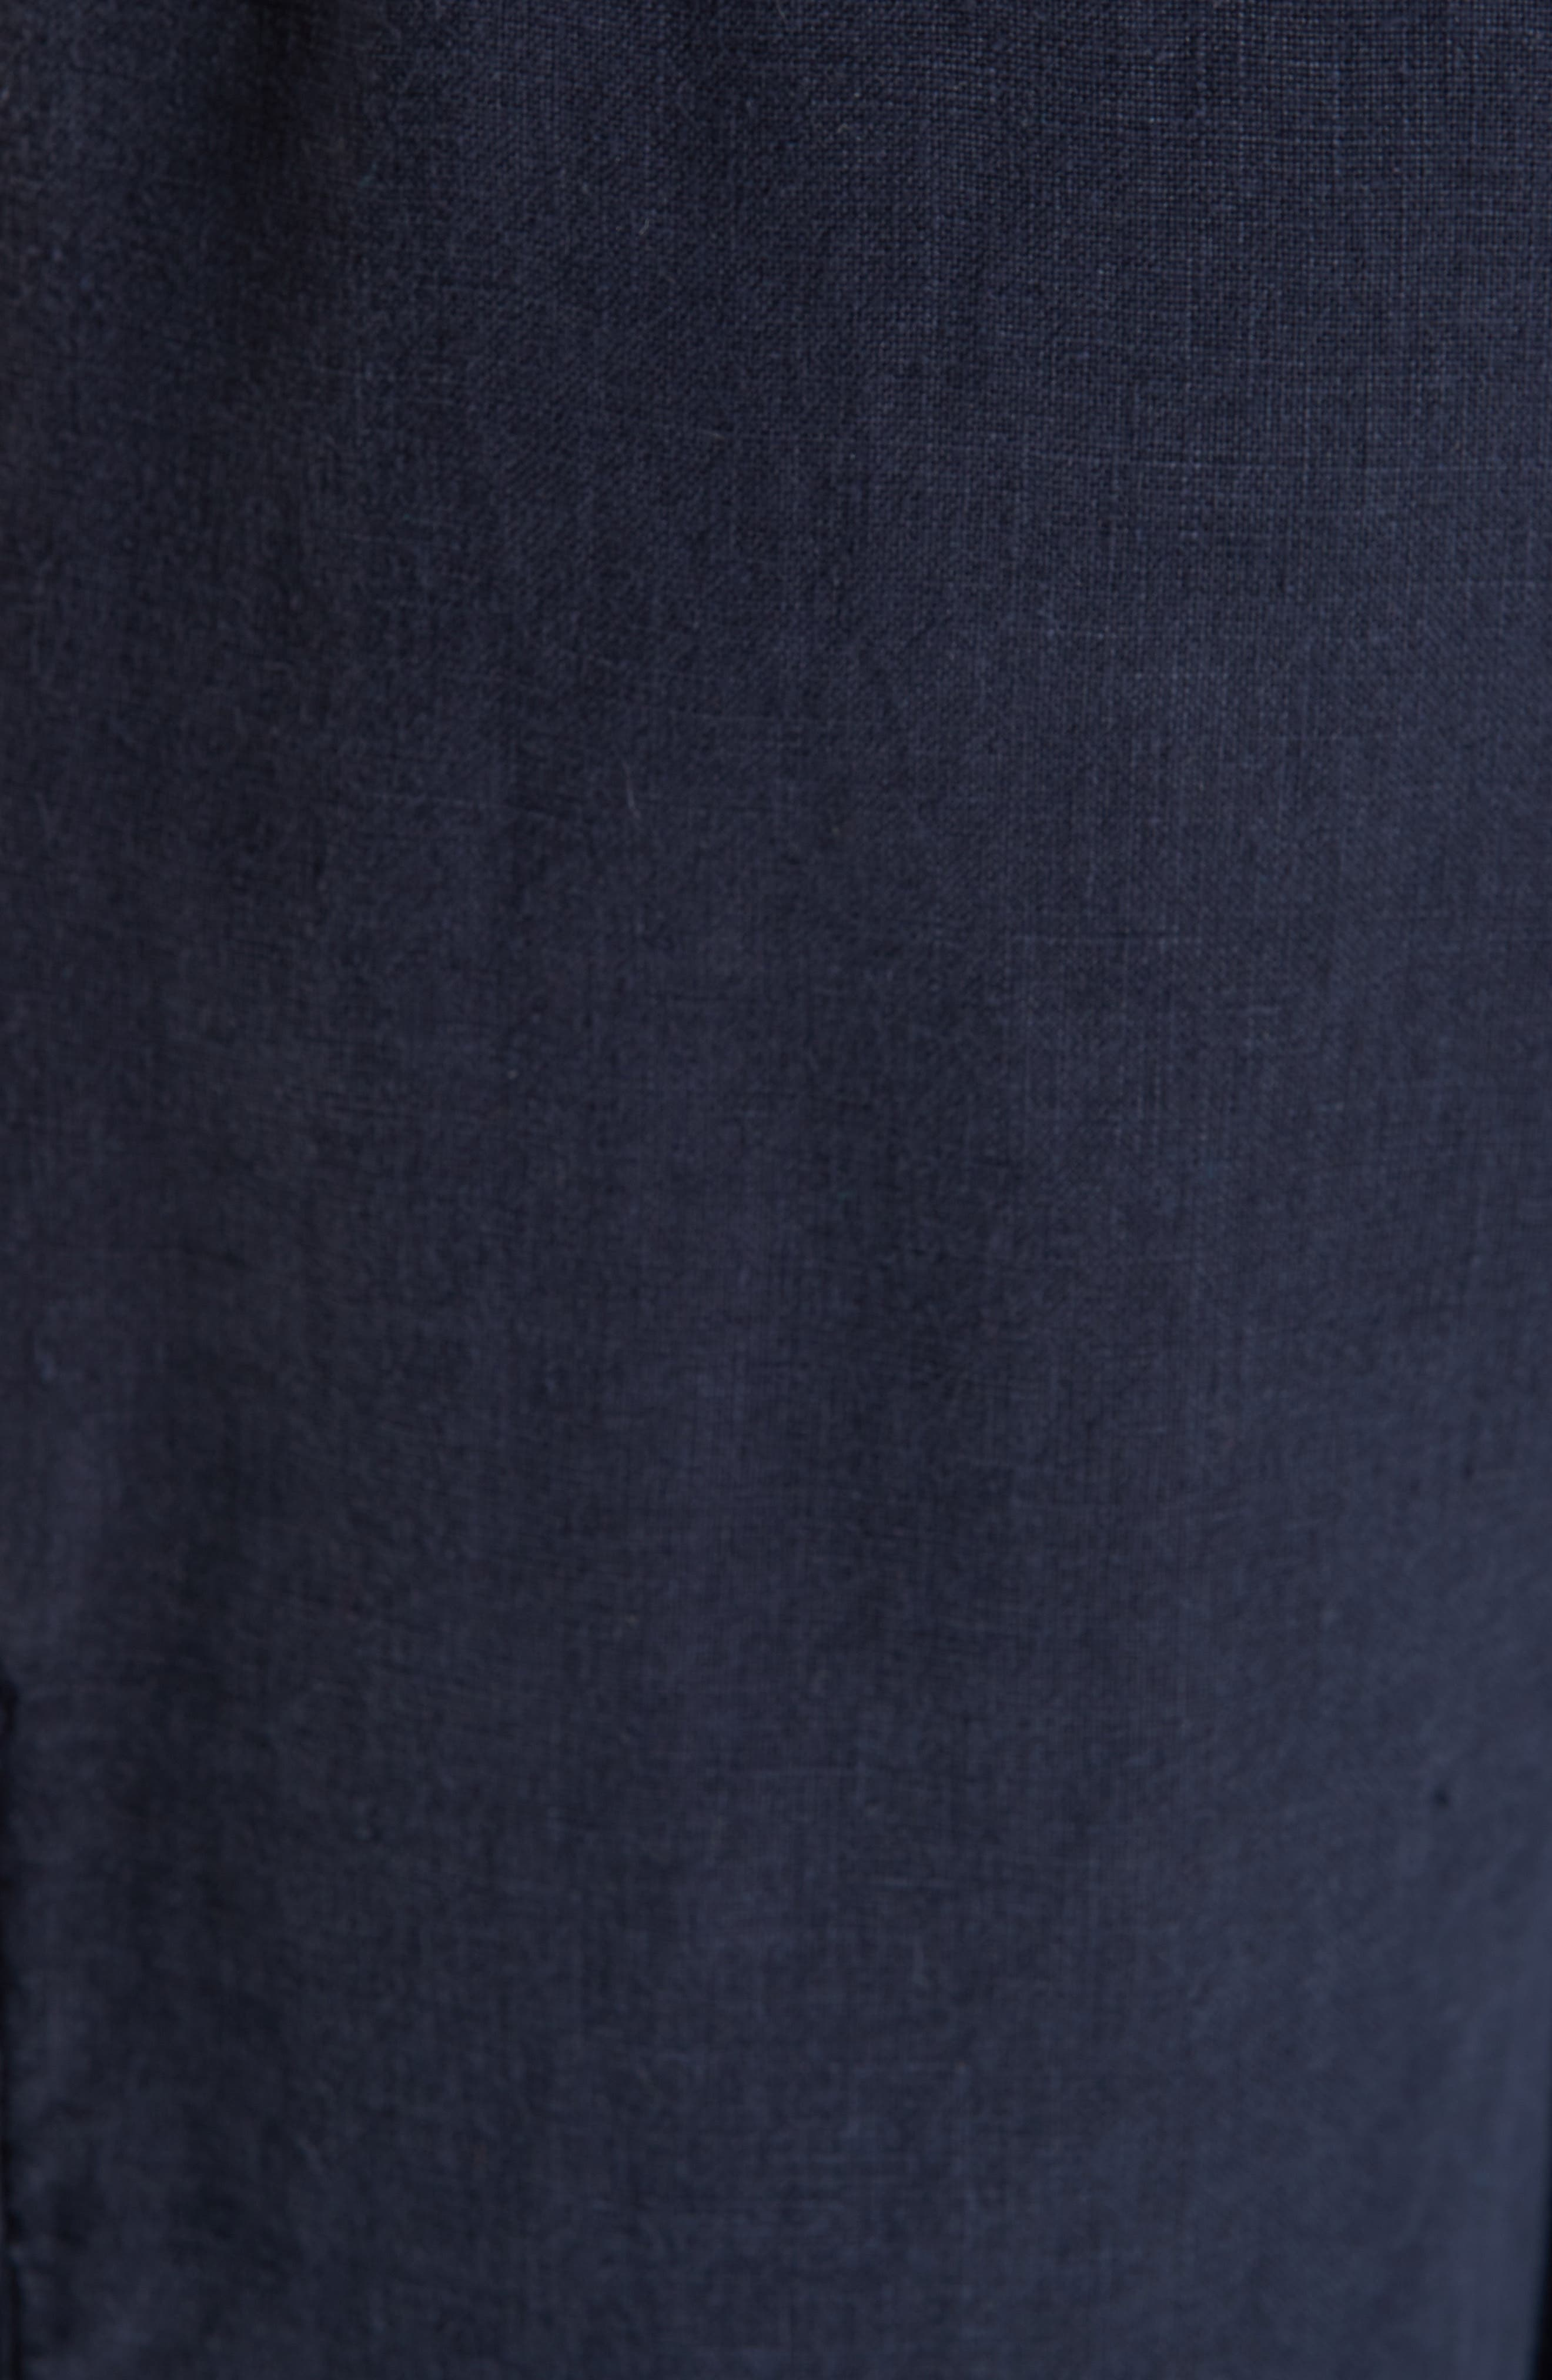 Vilbrequin Linen Cargo Shorts,                             Alternate thumbnail 5, color,                             BLUE